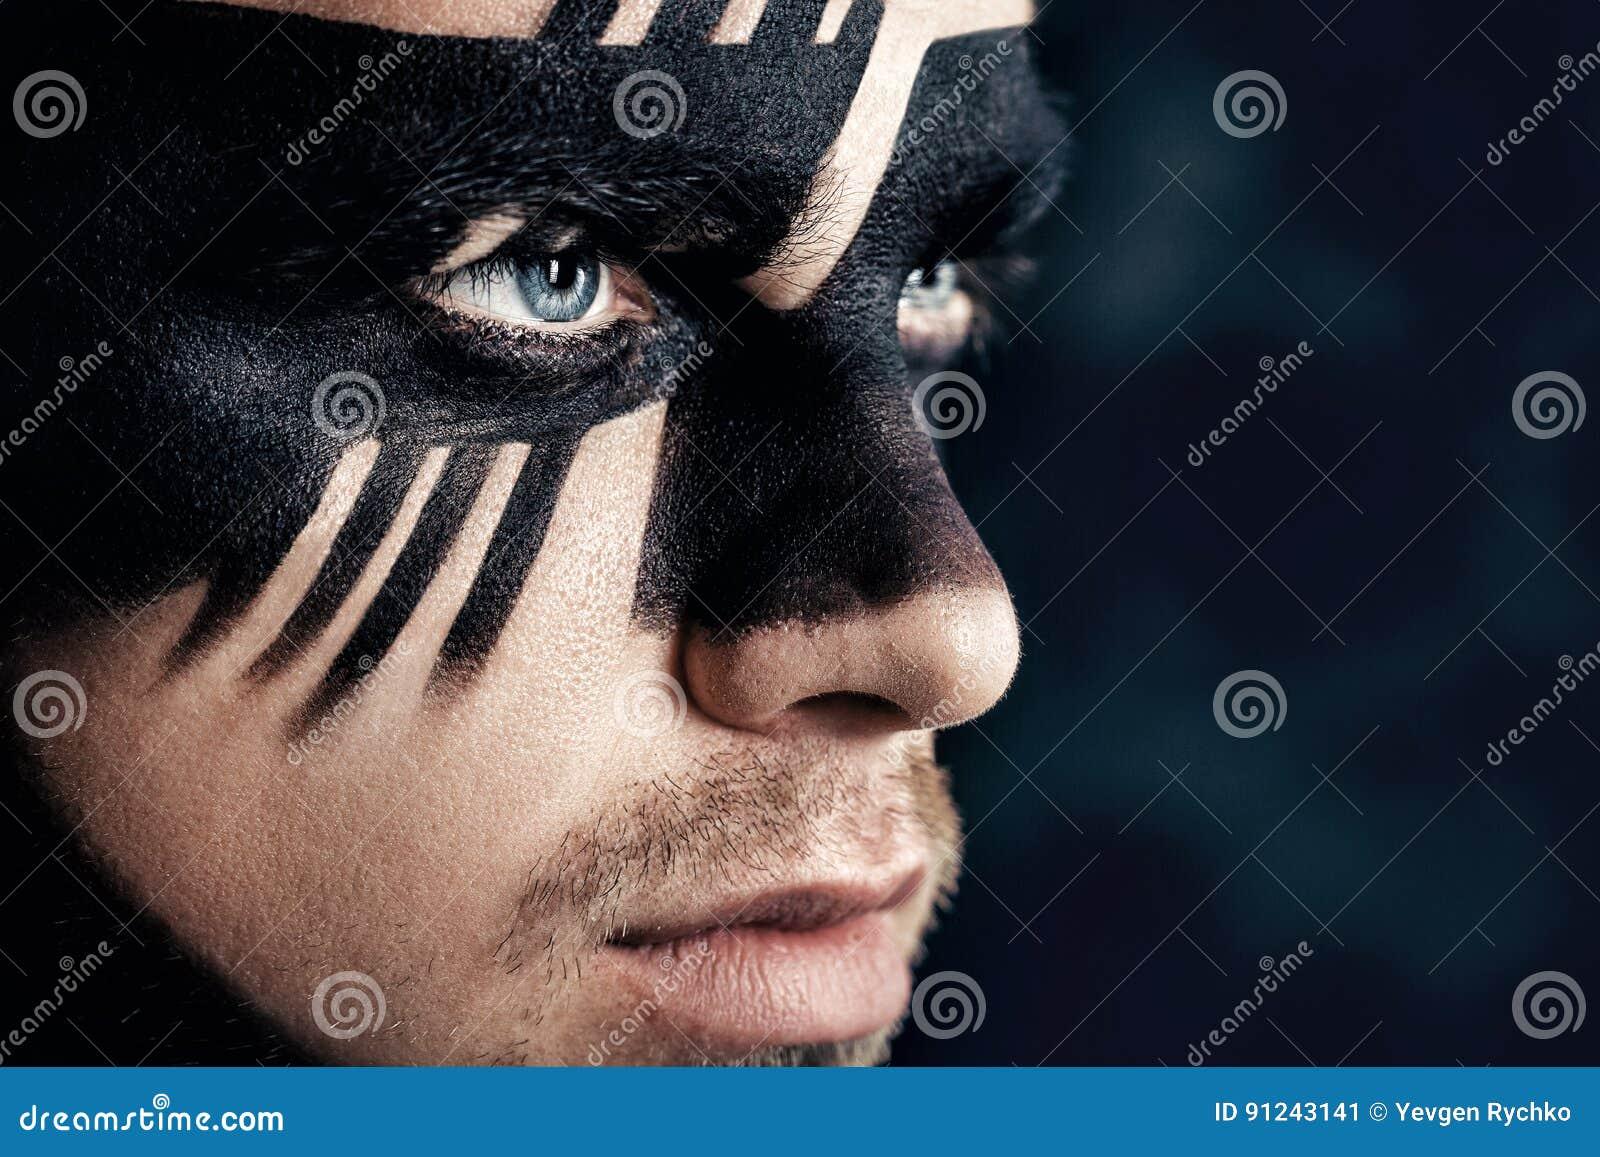 Fantasy art makeup. man with black painted mask on face. Close up Portrait. Professional Fashion Makeup.